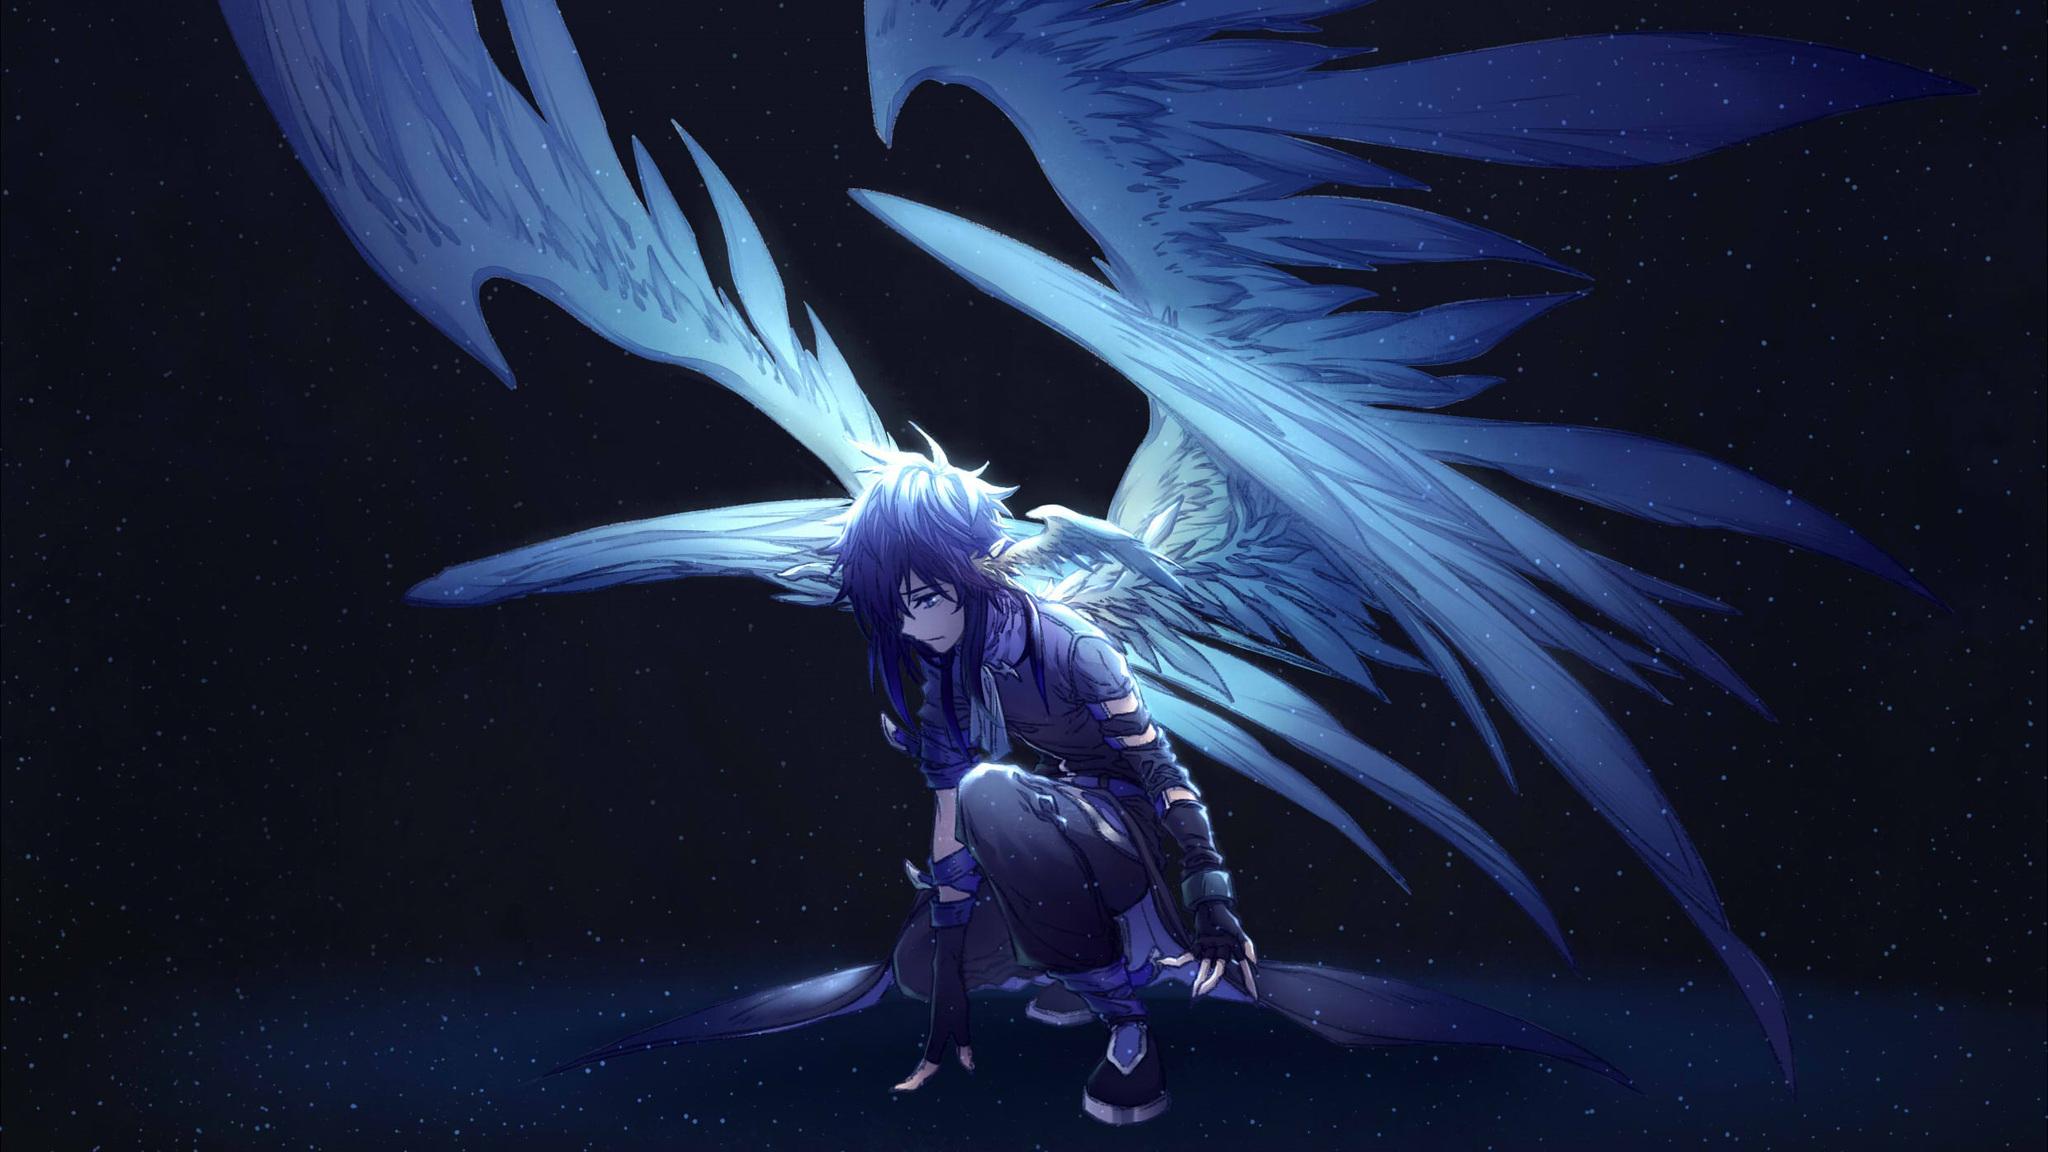 Anime 4k Wallpaper: 2048x1152 Angel Anime 2048x1152 Resolution HD 4k